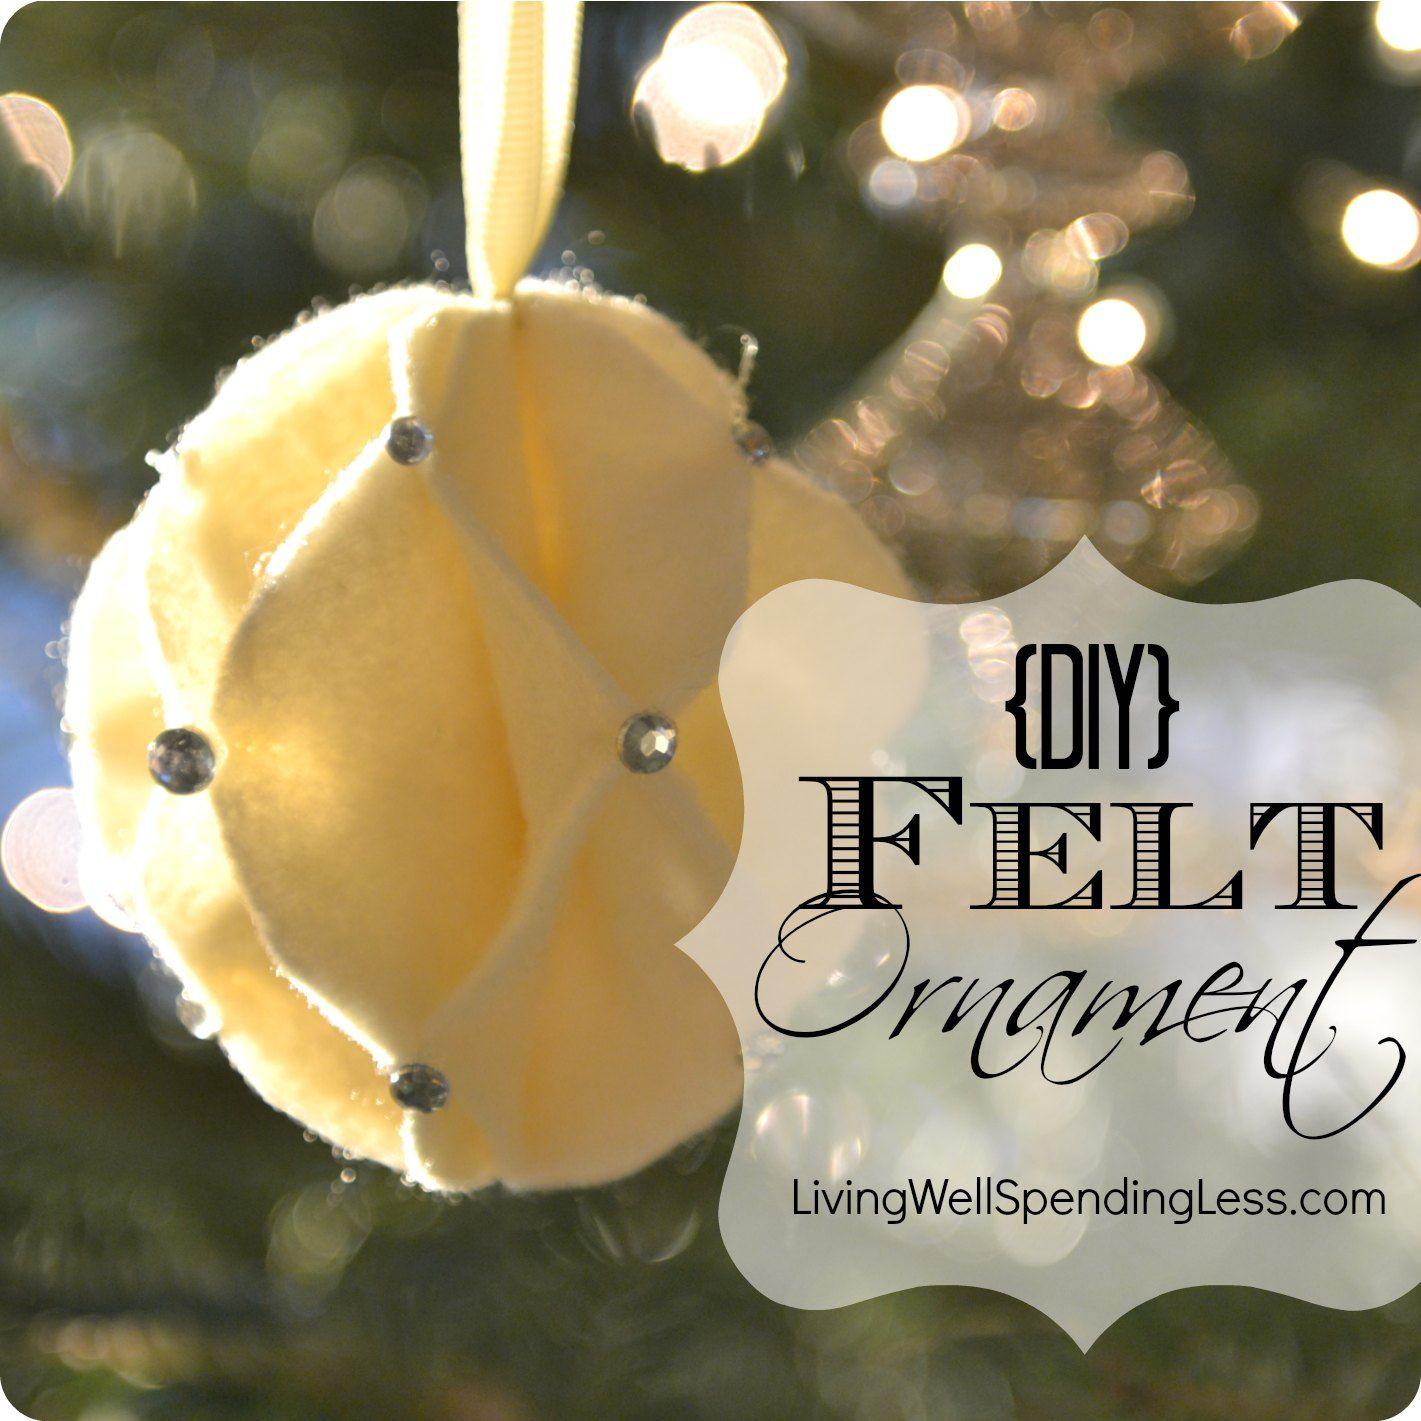 DiY felt snowball ornament--so cute!  #DiY #Christmas #Ornament